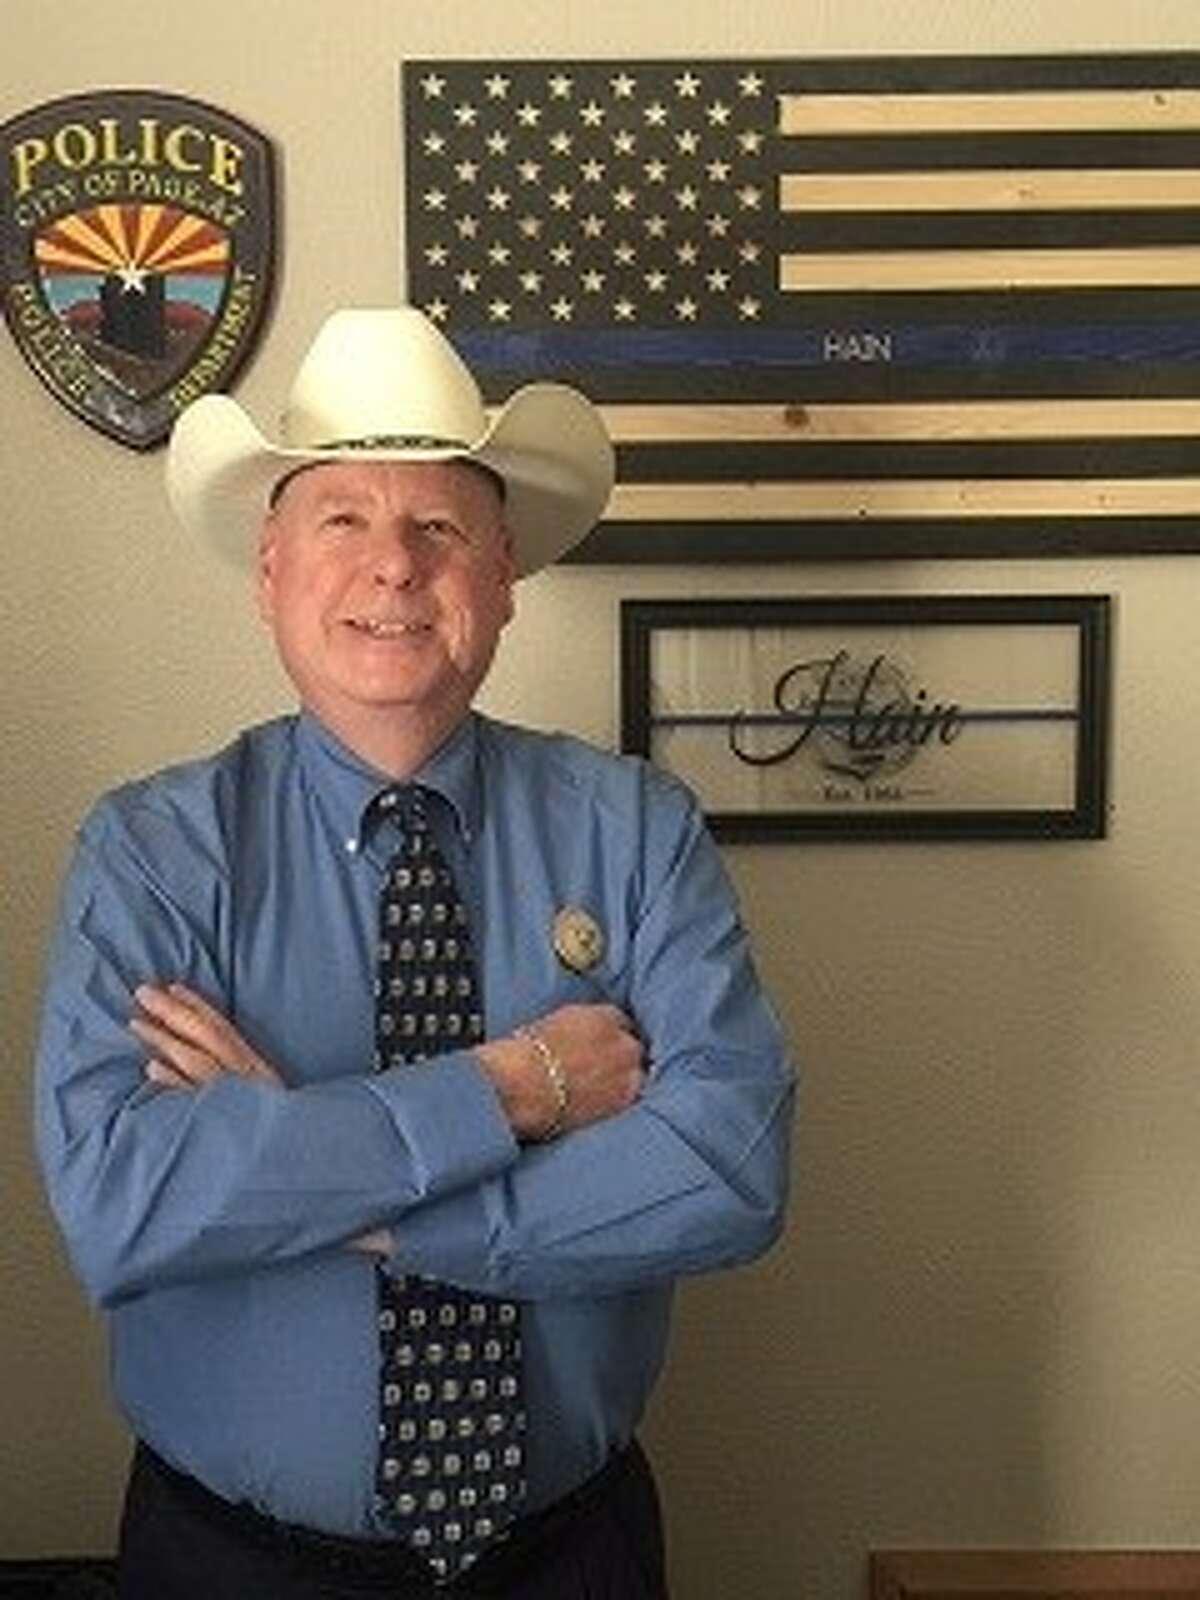 Tom Hain filed for Midland County sheriff